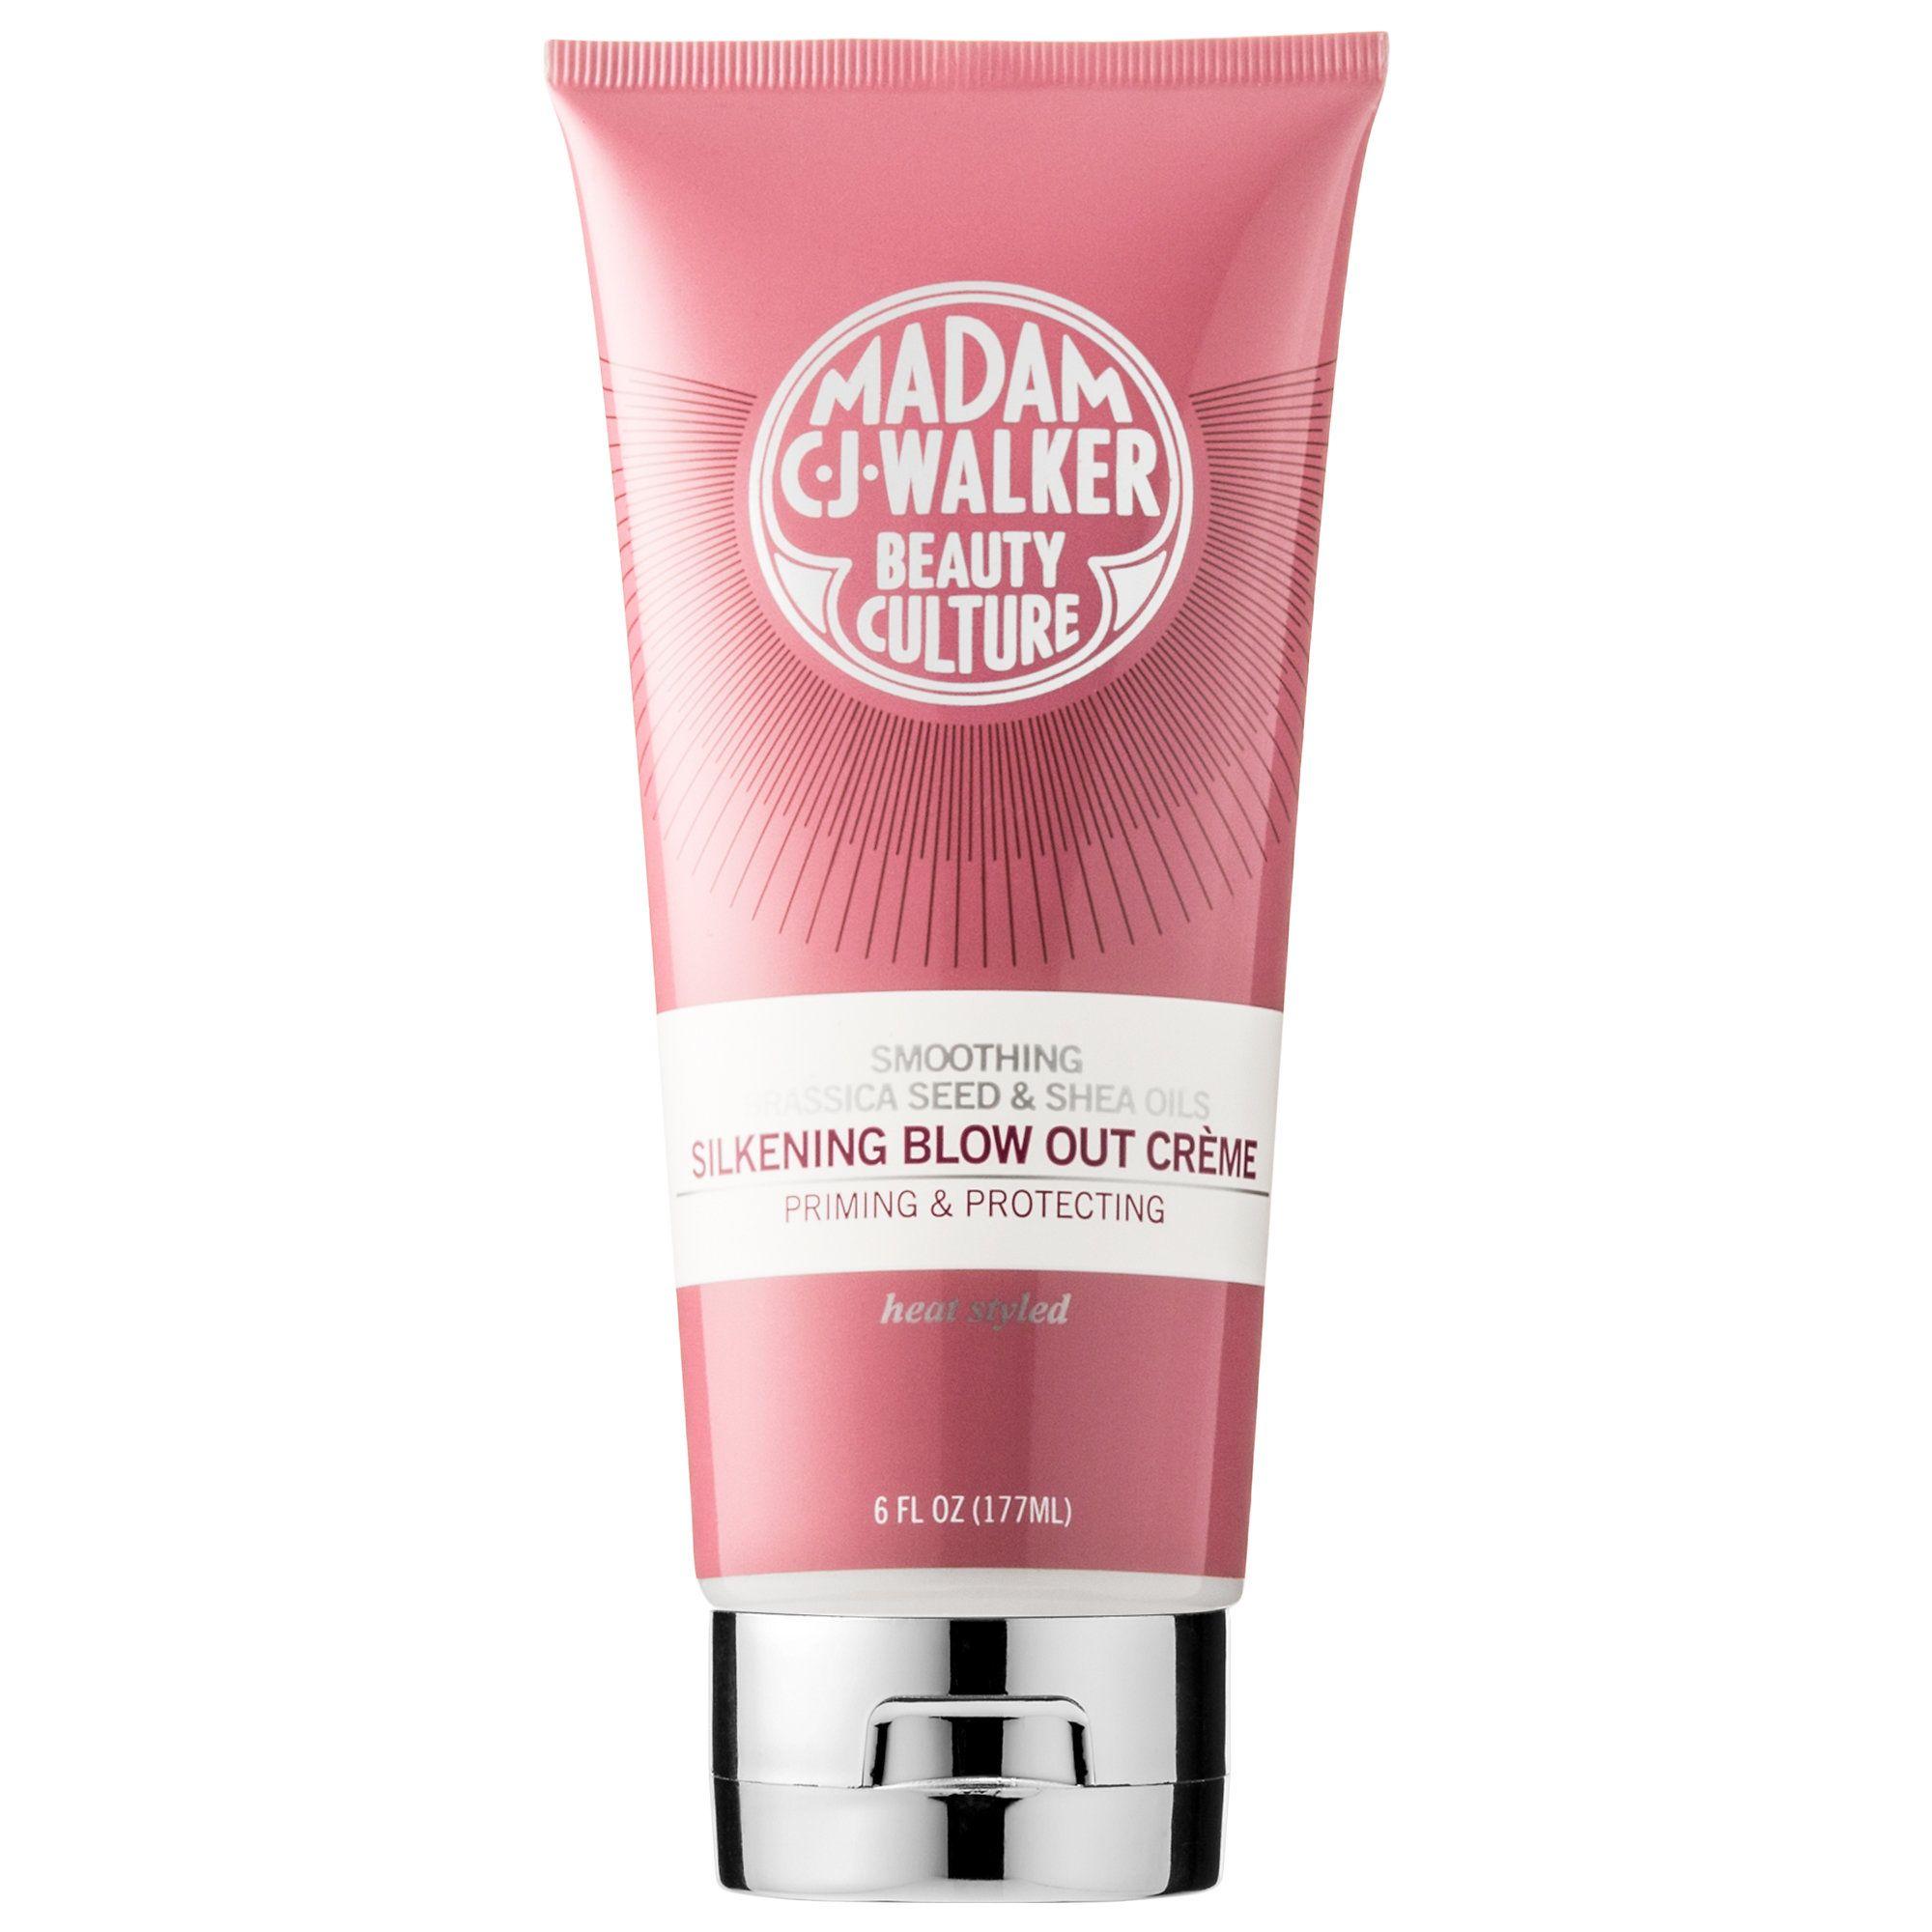 Shop Madam C J Walker S Bcreme At Sephora The Heat Protective Cream Creates A Smooth Easy Brush Glide Blowout Cream Sephora Madam Cj Walker